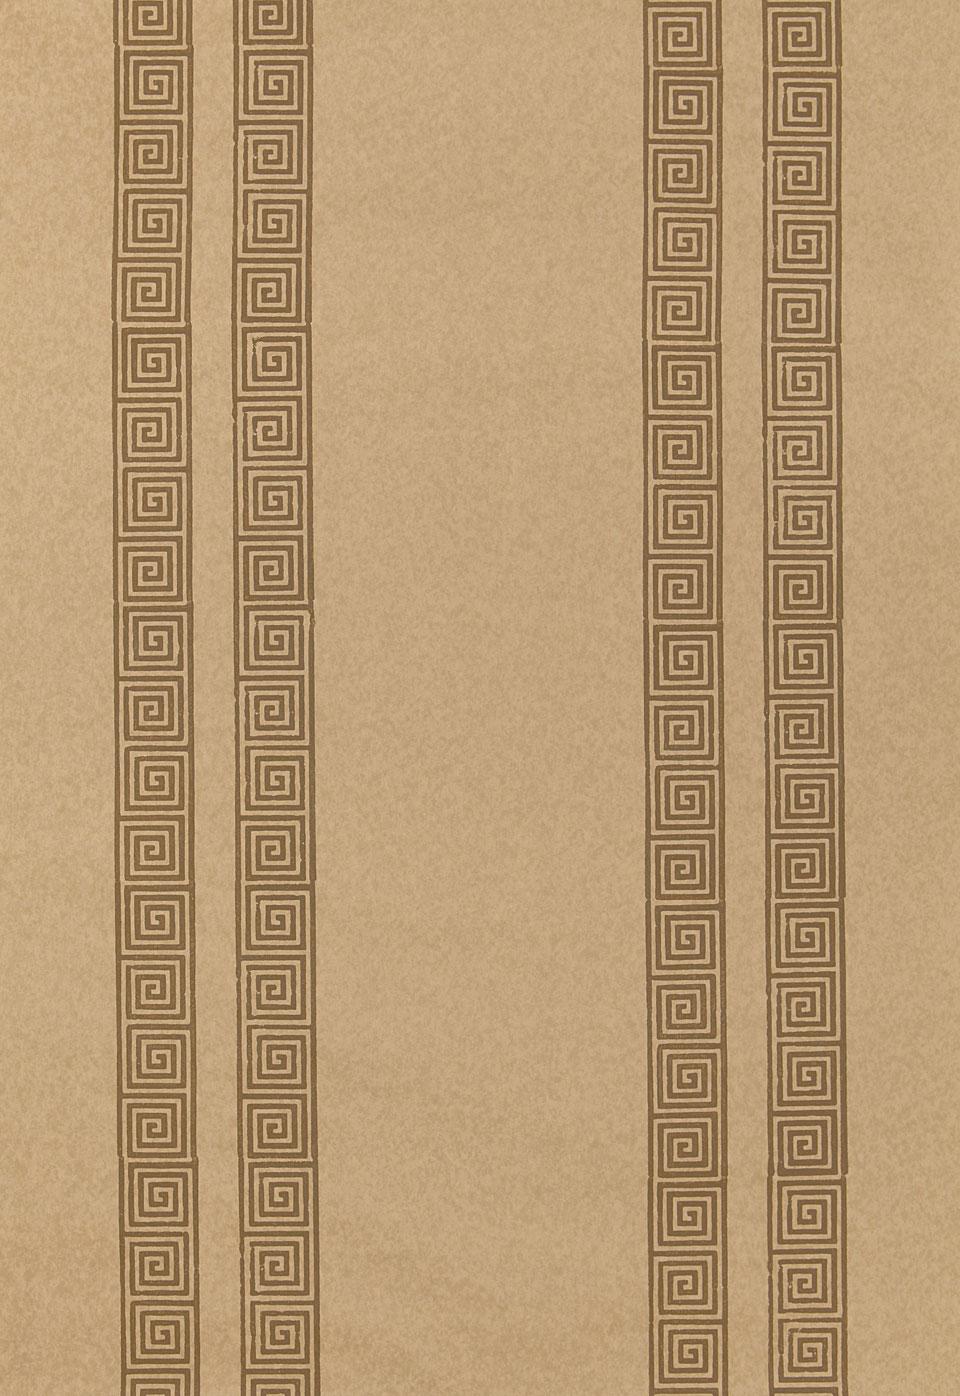 Chinoiserie Chic Greek Key Wallpaper 960x1396